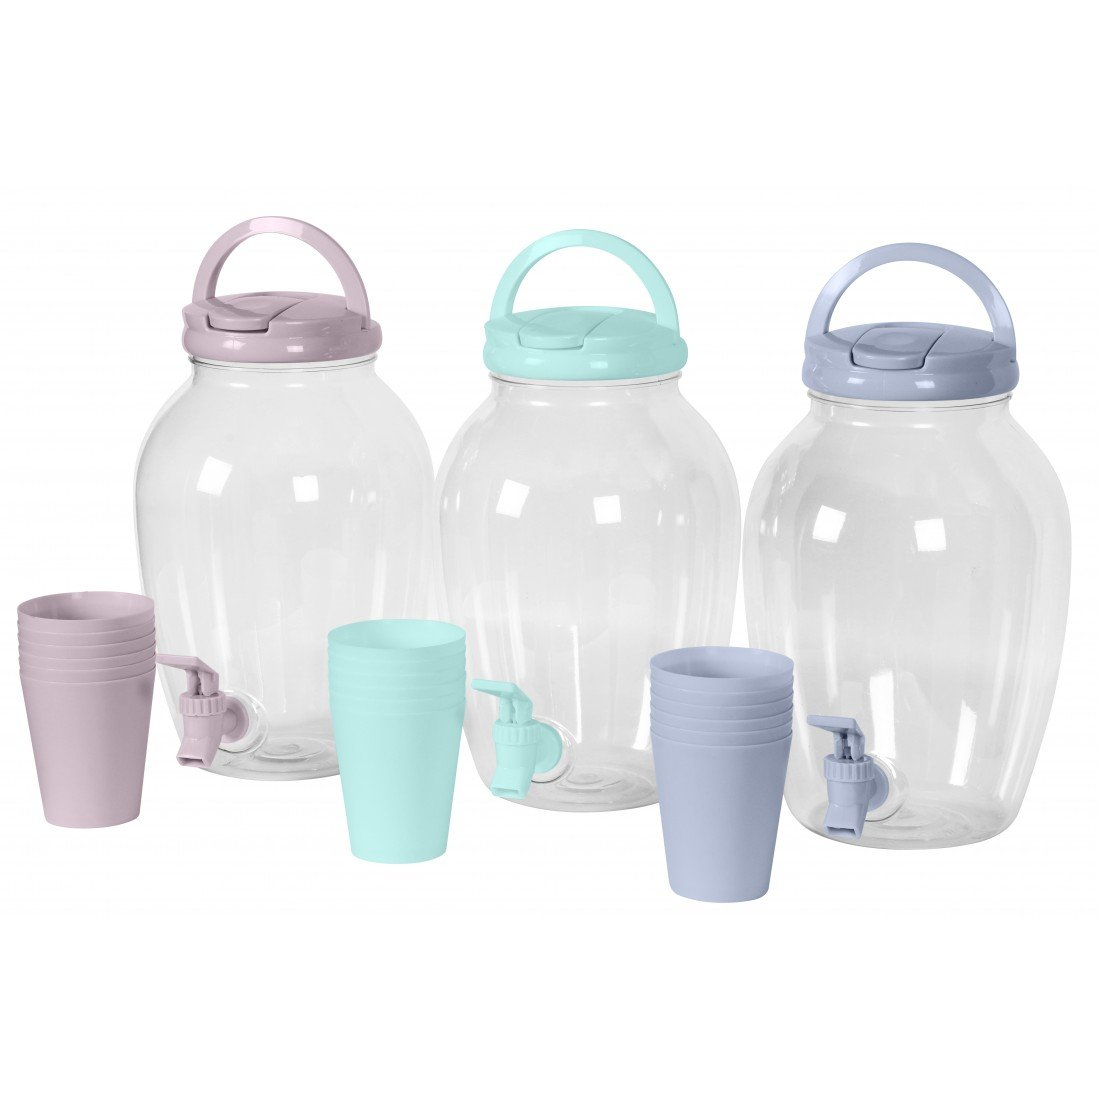 Compra Dispensador de bebidas 4 L Dispenser 6 vasos agua dispensador de limonada icetea surtidor en Amazon.es